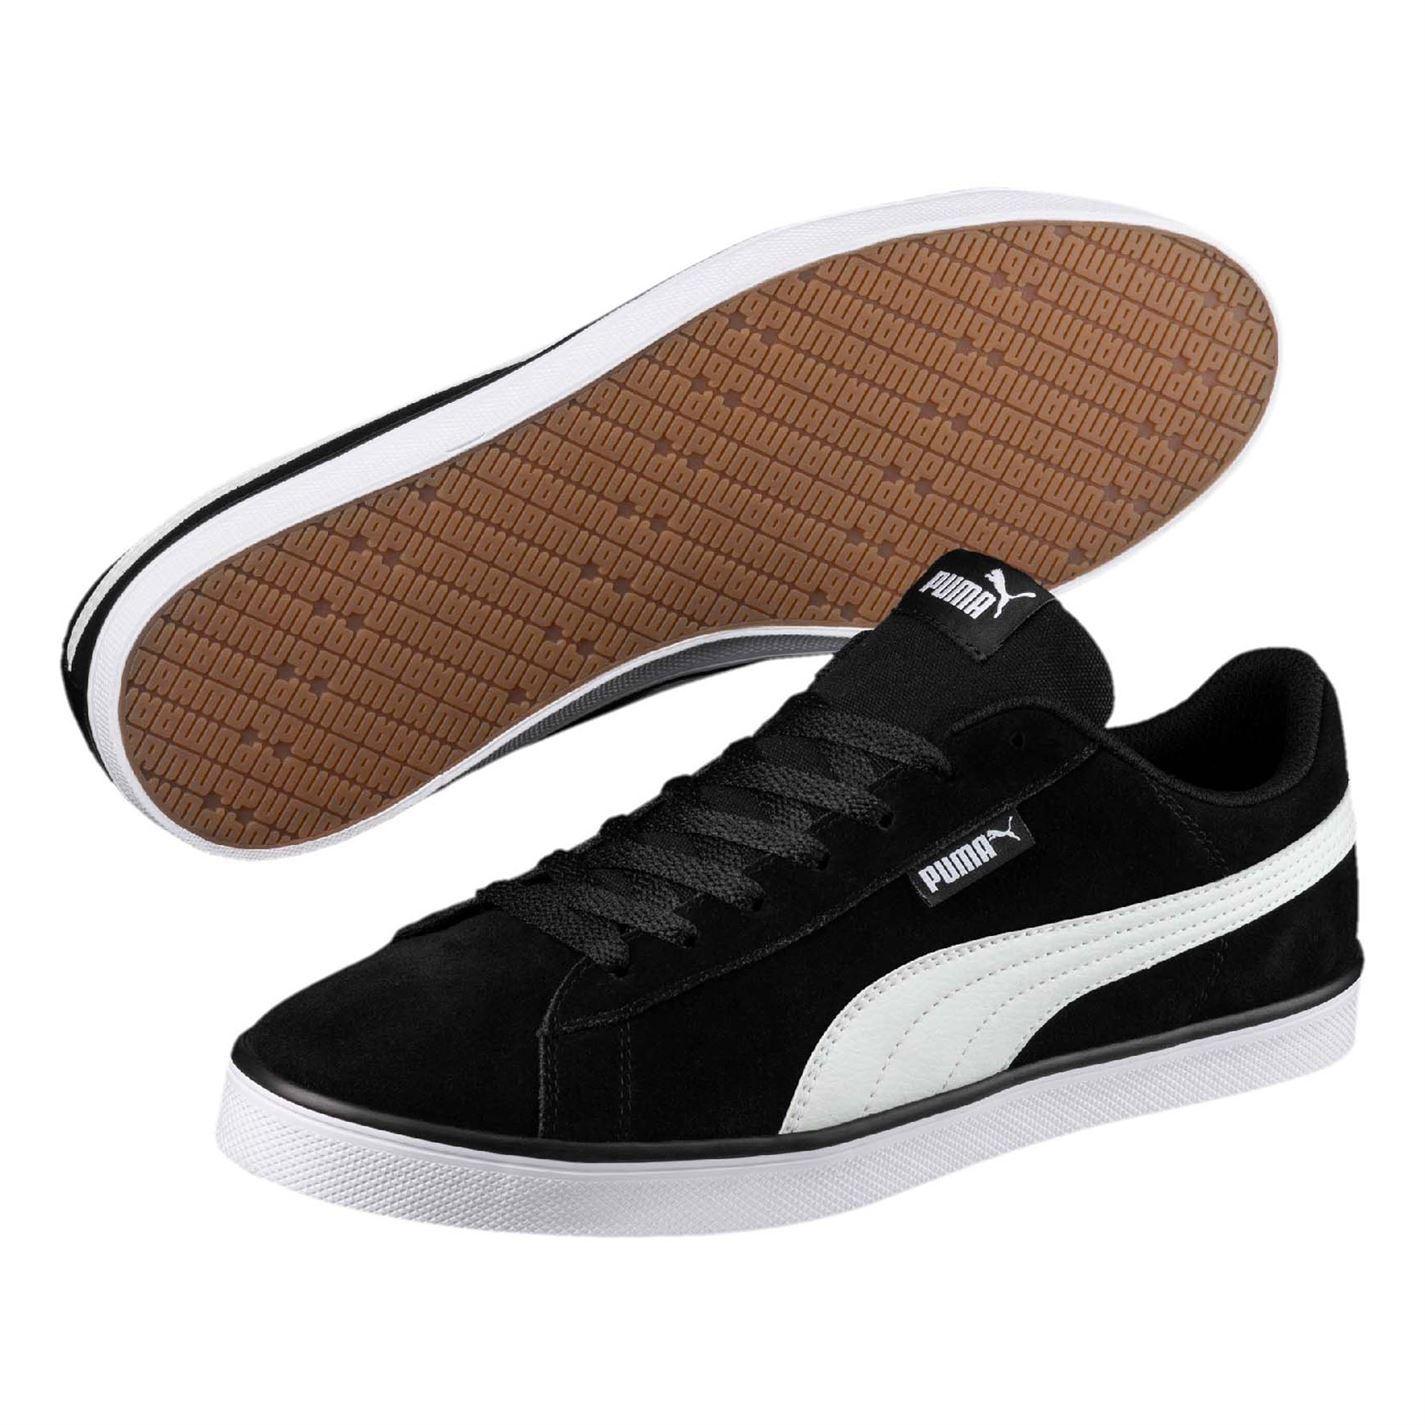 Plus Herren Urban Sneakers8fd9cdd8f4db2bd633174a12abc58066